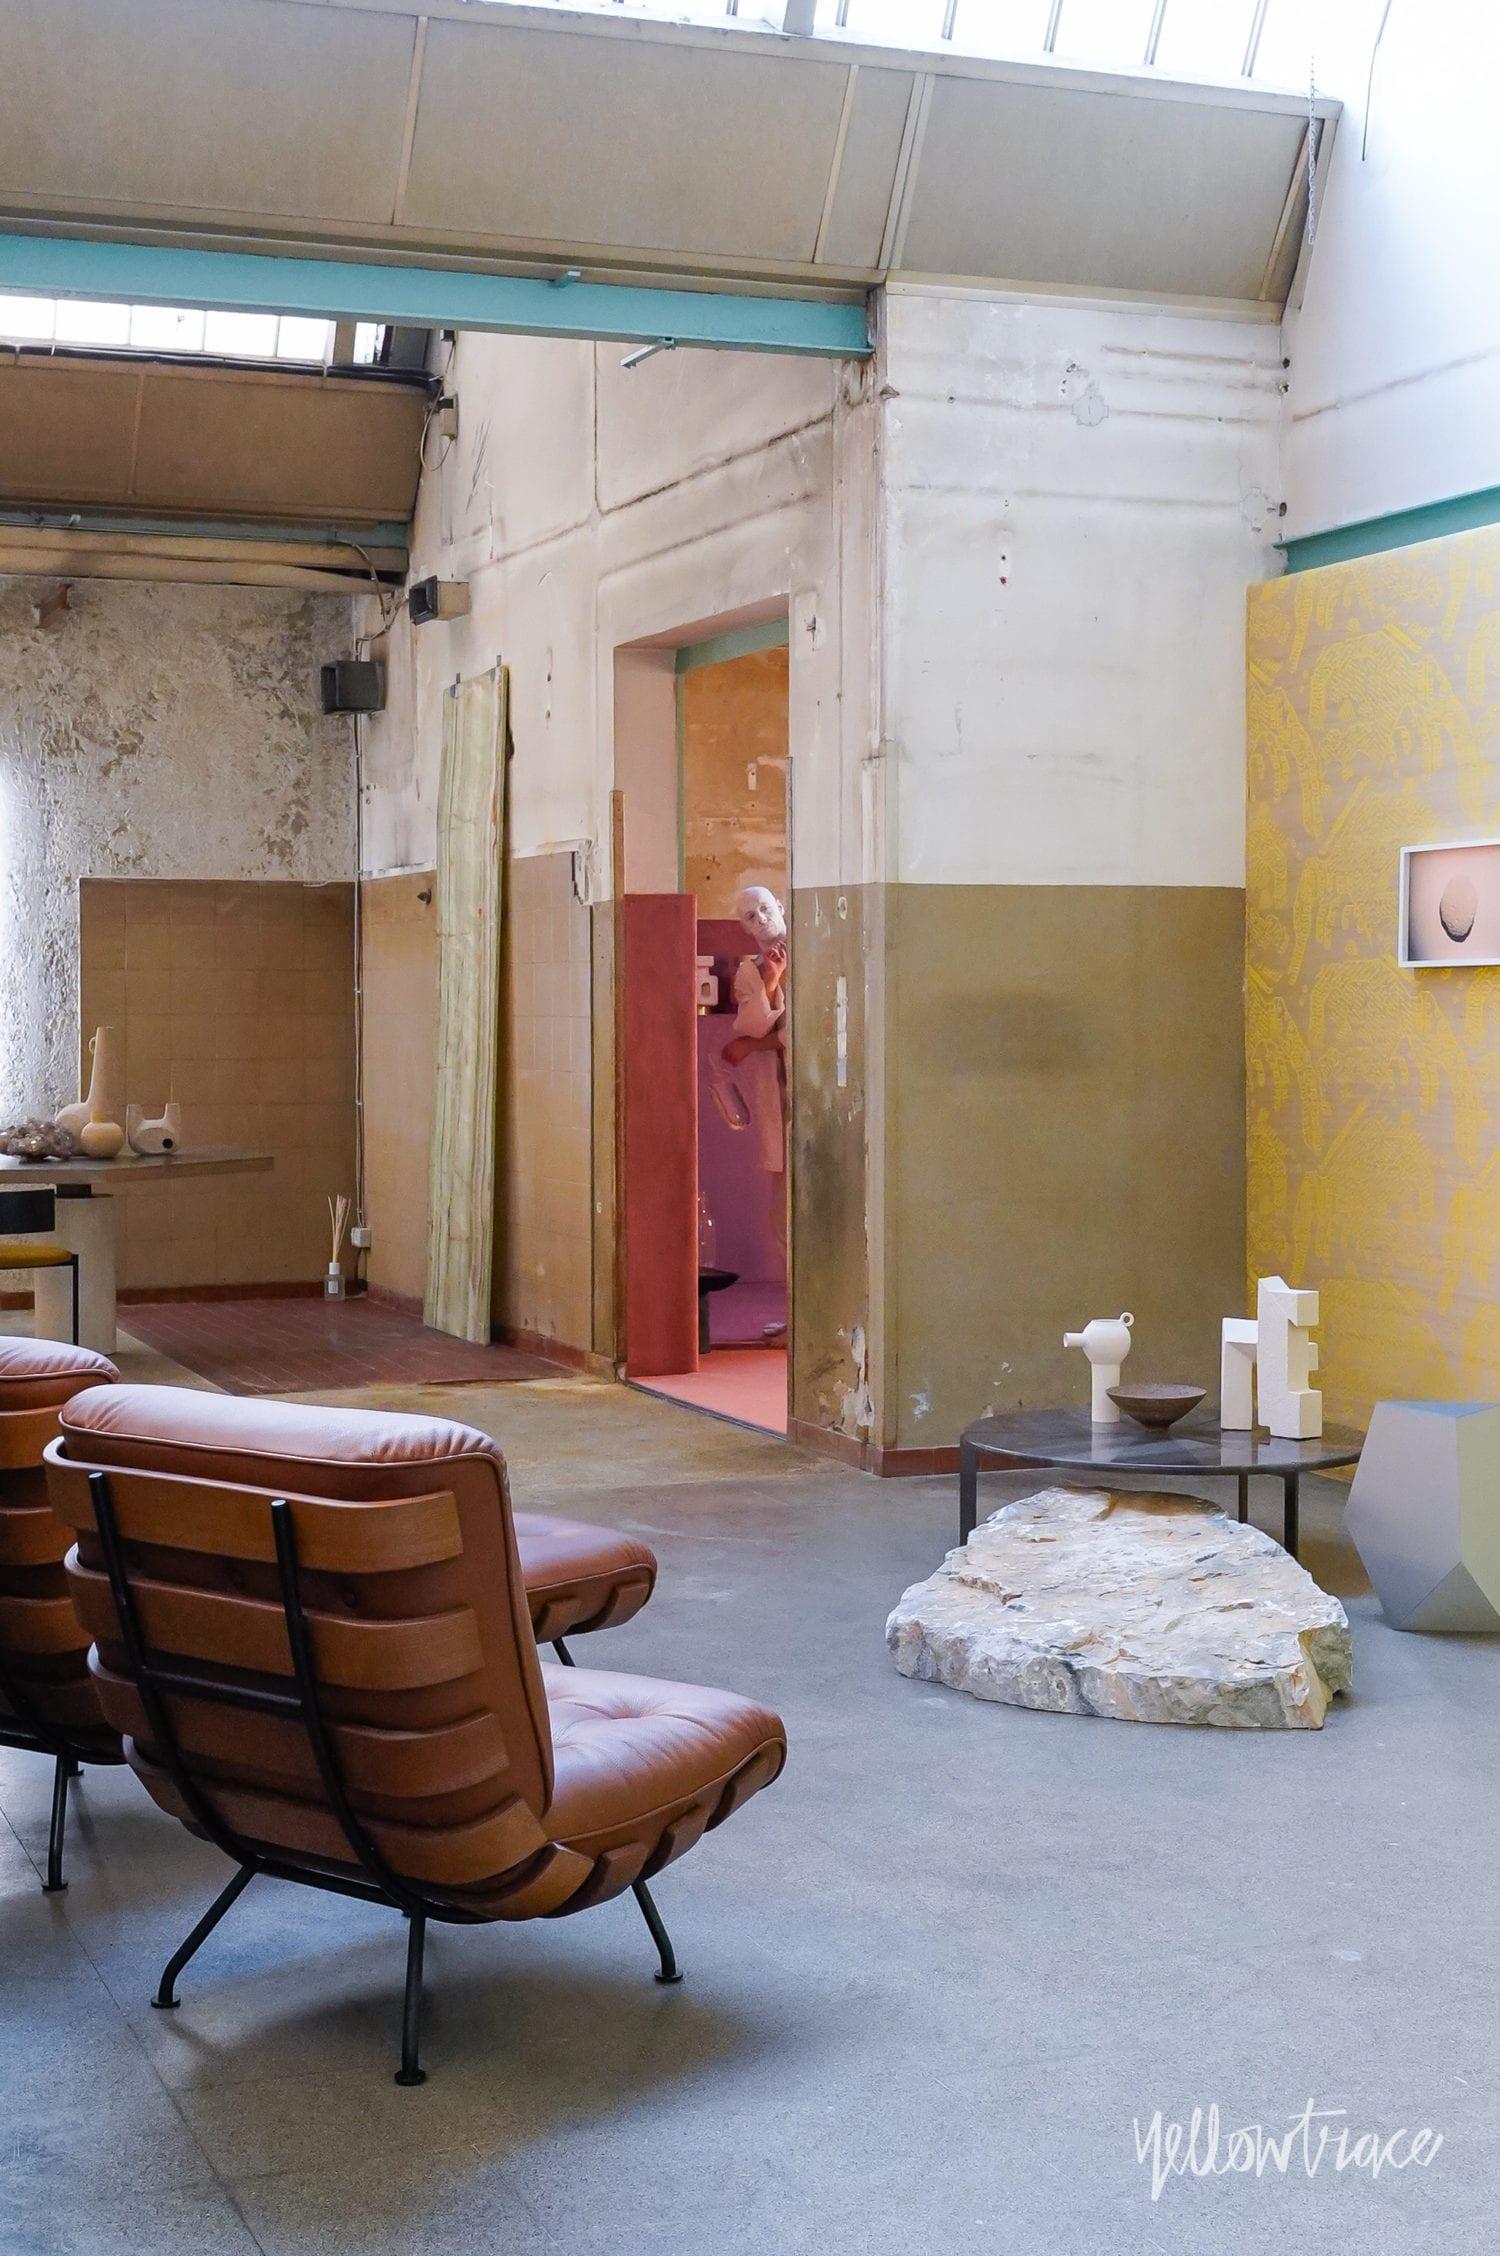 Les Arcanistes Studiopepe At Milan Design Week 2019 Photo Nick Hughes Yellowtrace 29